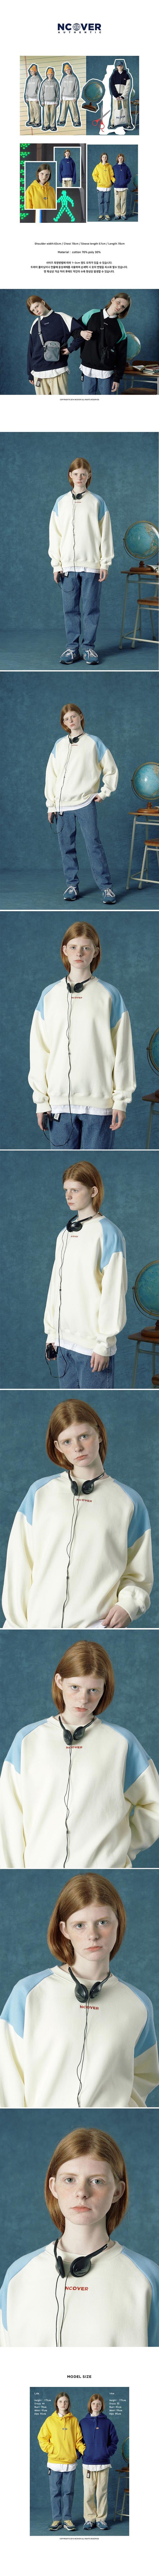 Ncover-embroidery-sweatshirt-cream.jpg